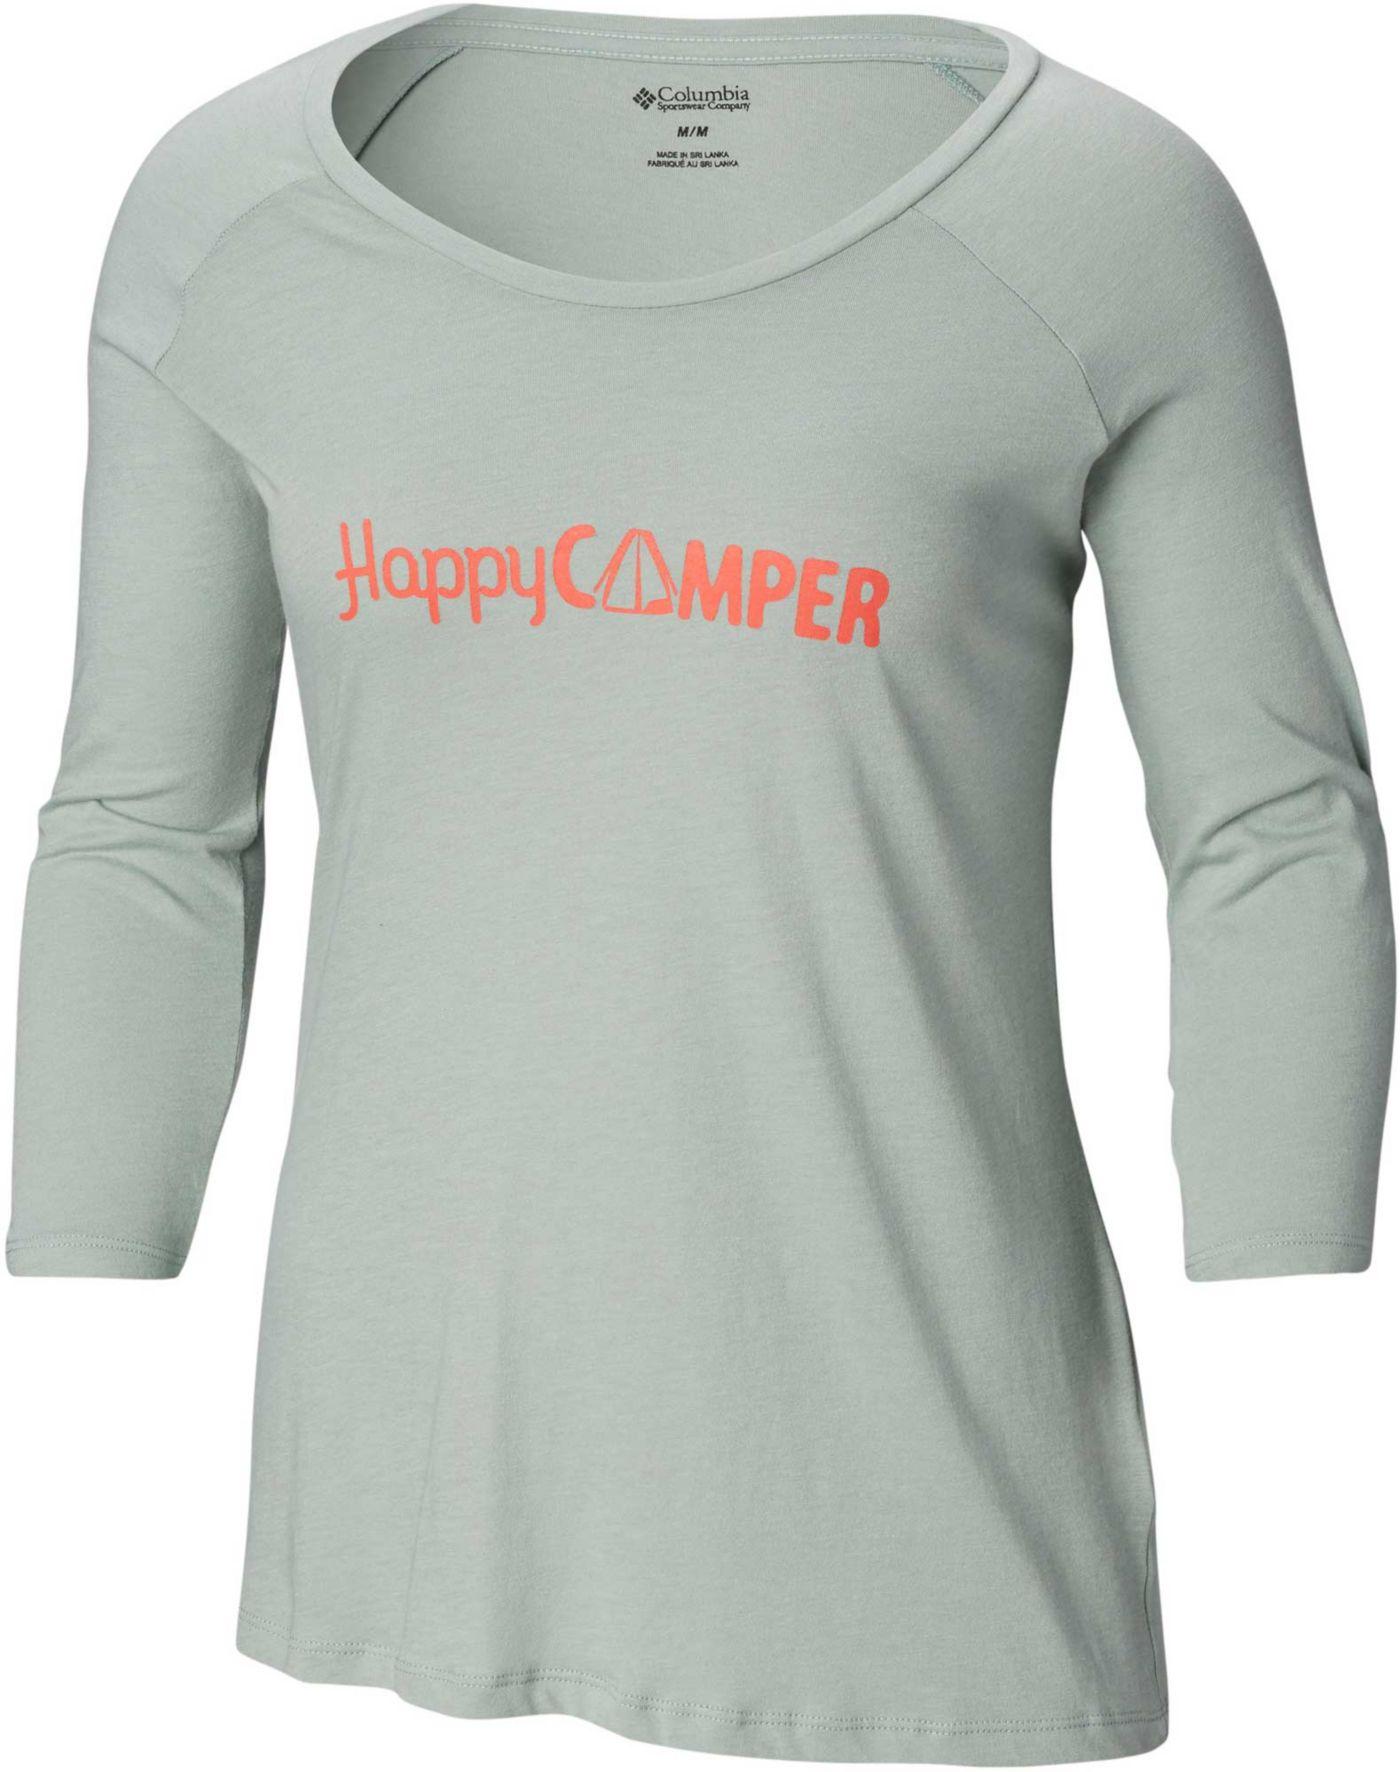 Columbia Women's Weekend Explorer 3/4 T-Shirt